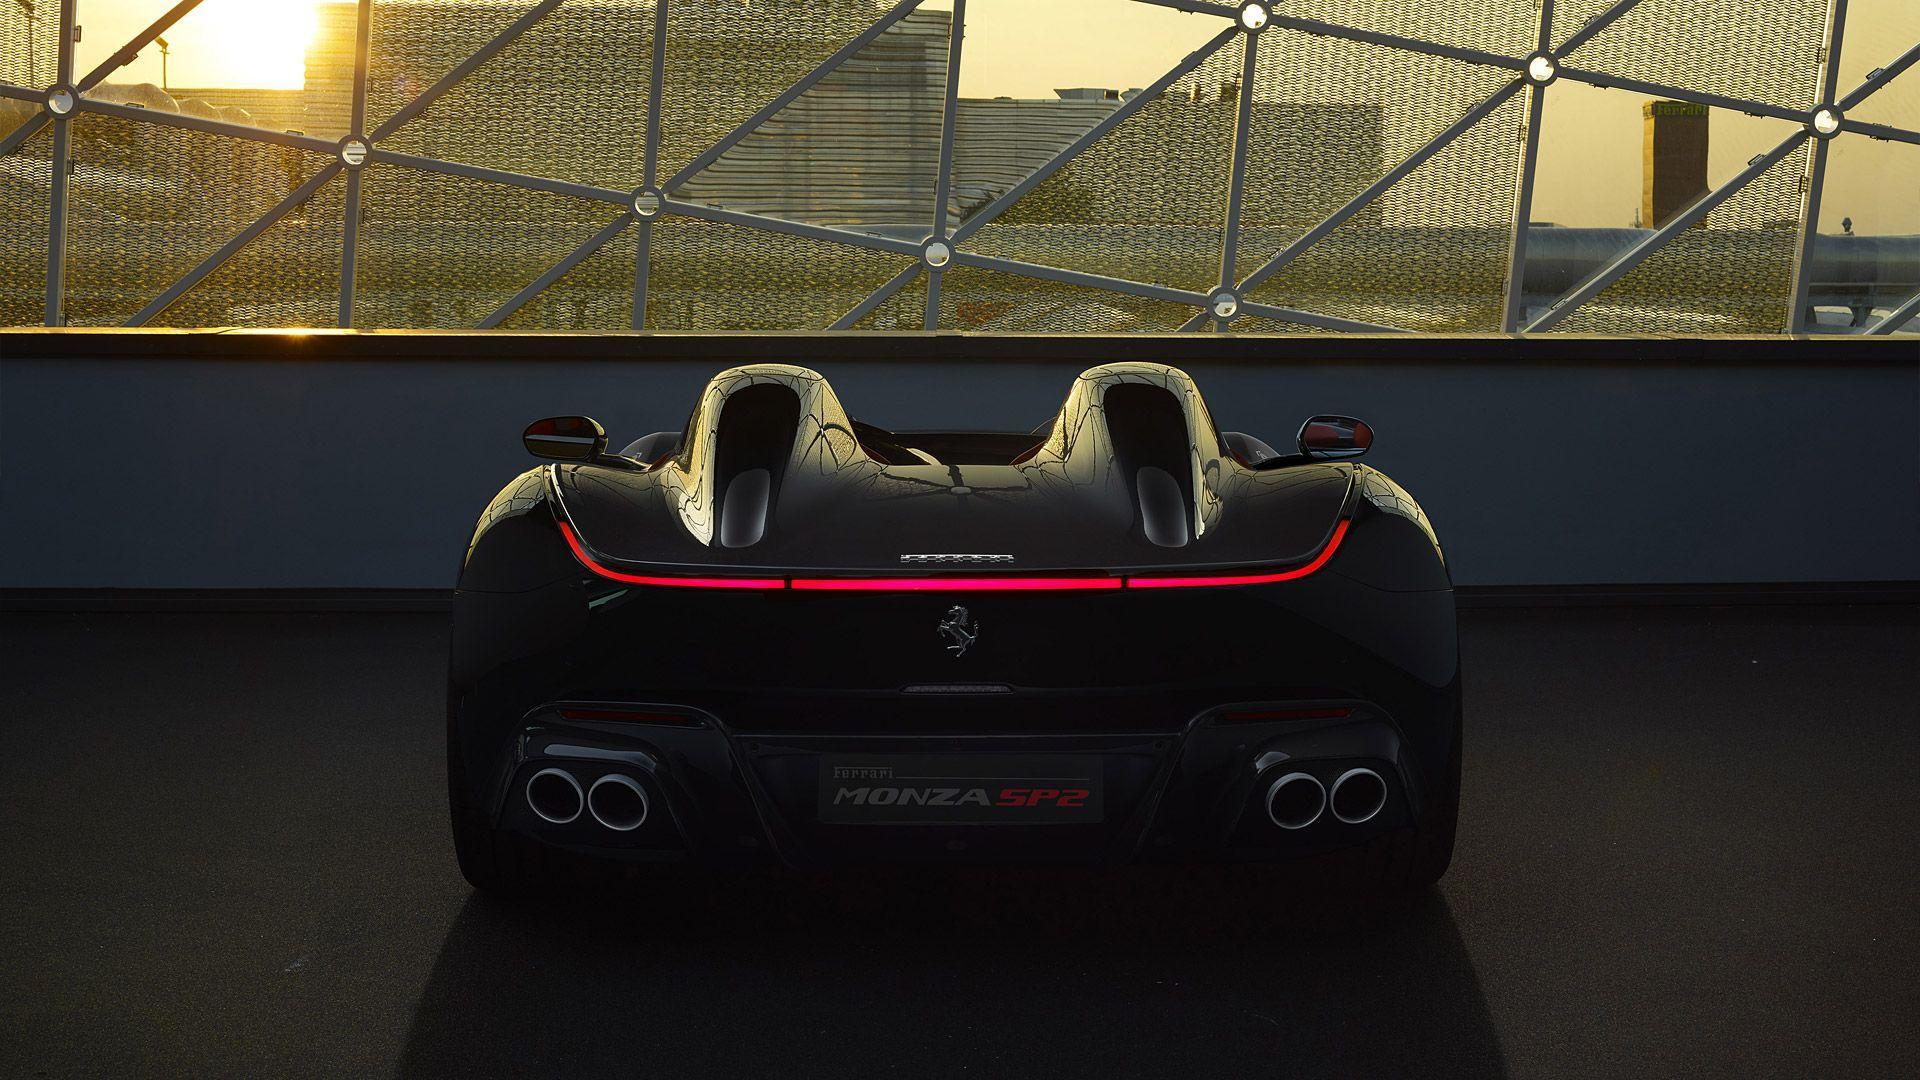 Ferrari Monza Sp2 Wallpapers Top Free Ferrari Monza Sp2 Backgrounds Wallpaperaccess